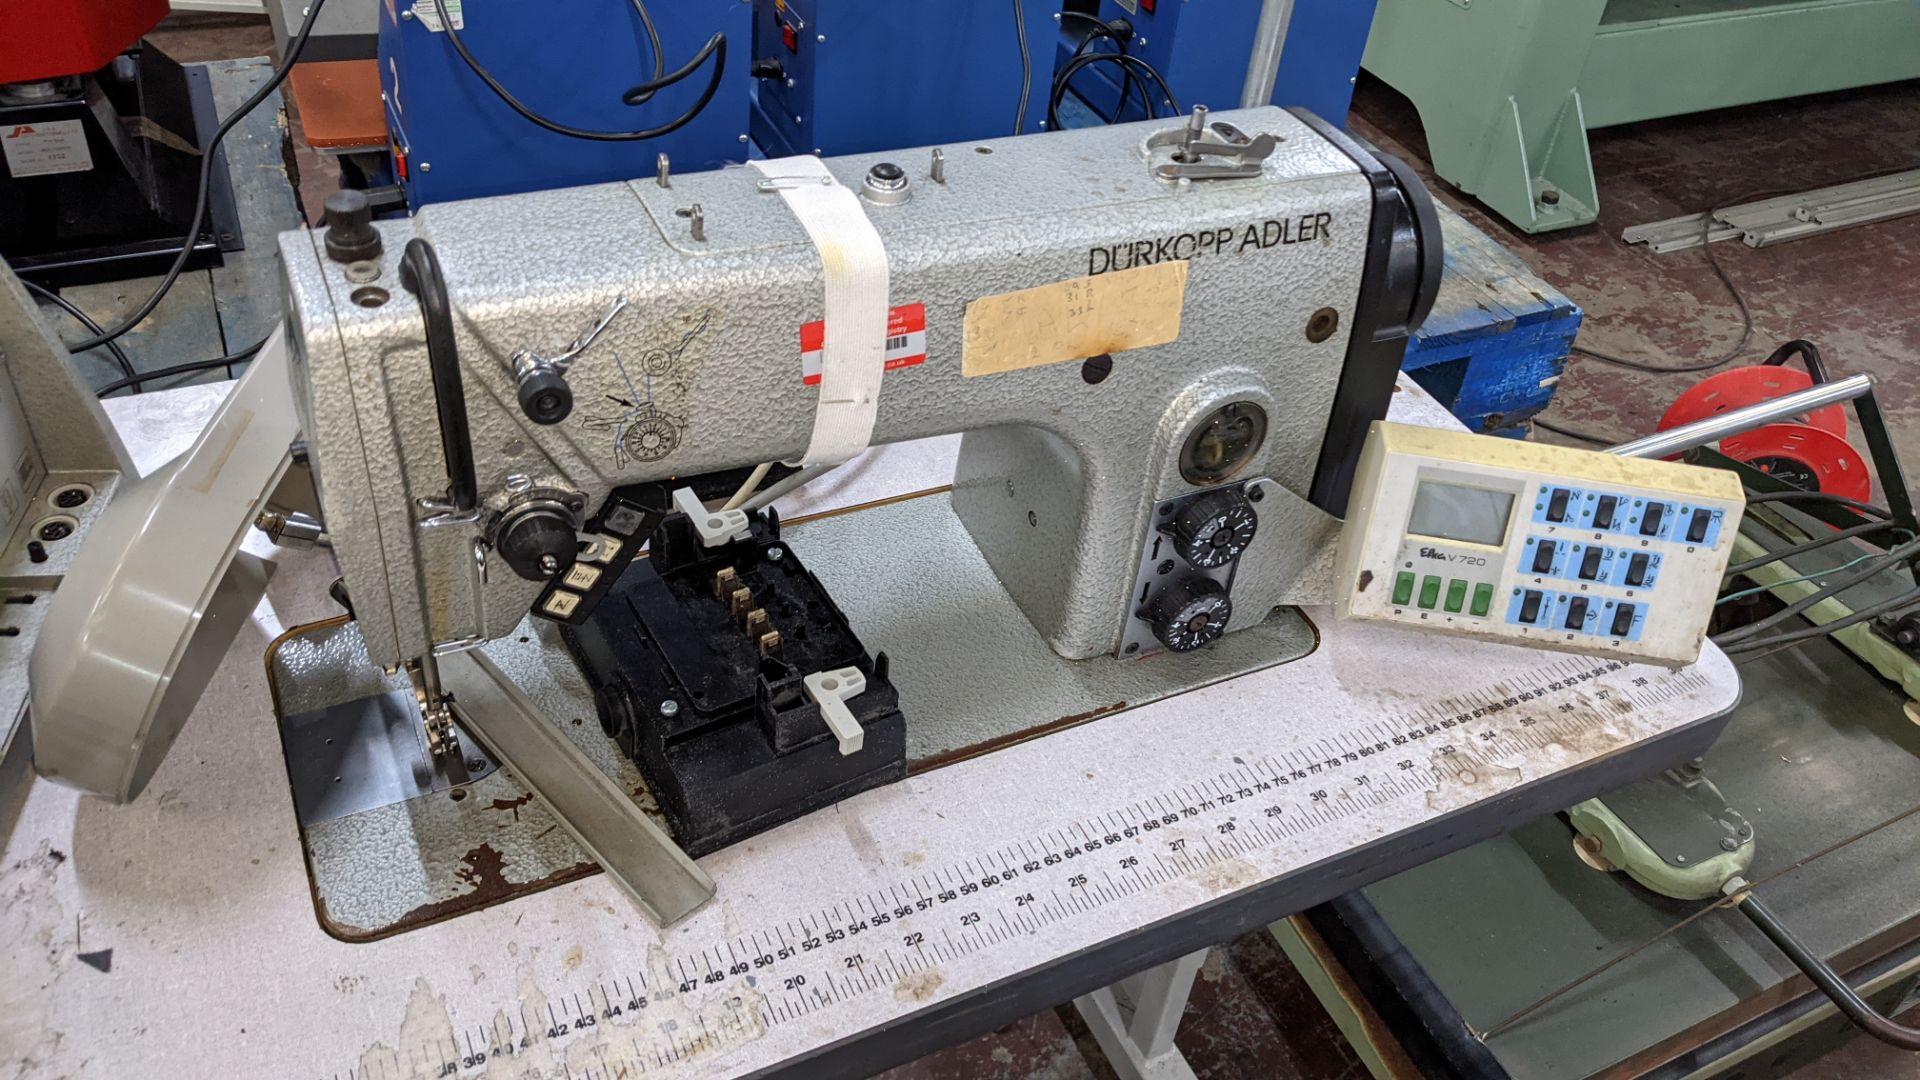 Durkopp Adler type 0271-L40042 sewing machine - Image 7 of 19